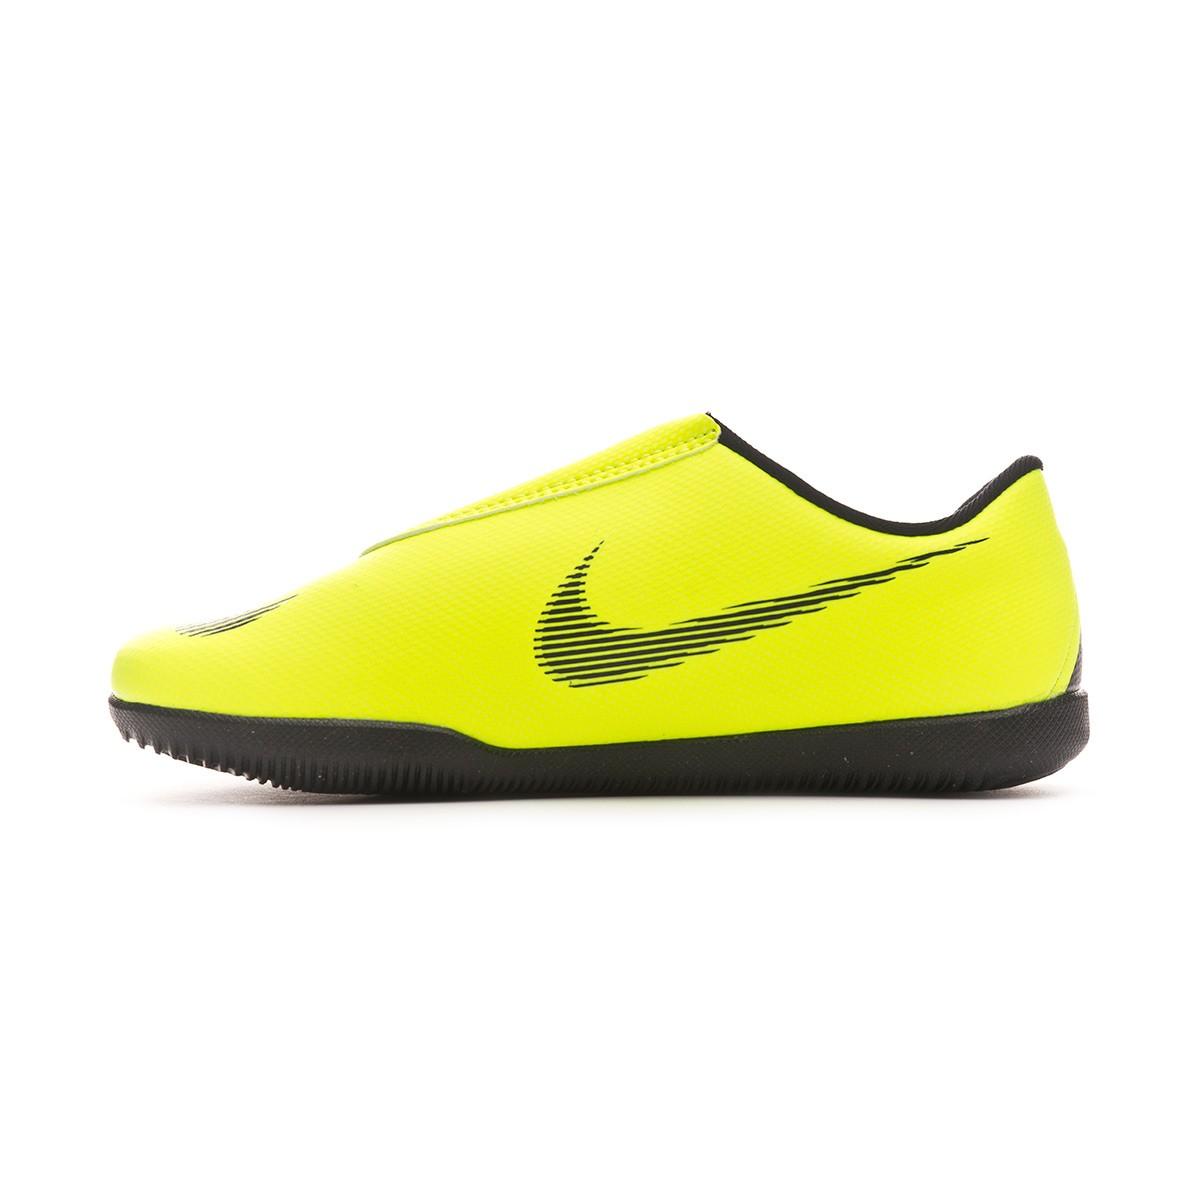 84c3e534b38 Futsal Boot Nike Kids Mercurial Vapor XII Club IC Velcro Volt-Black - Football  store Fútbol Emotion